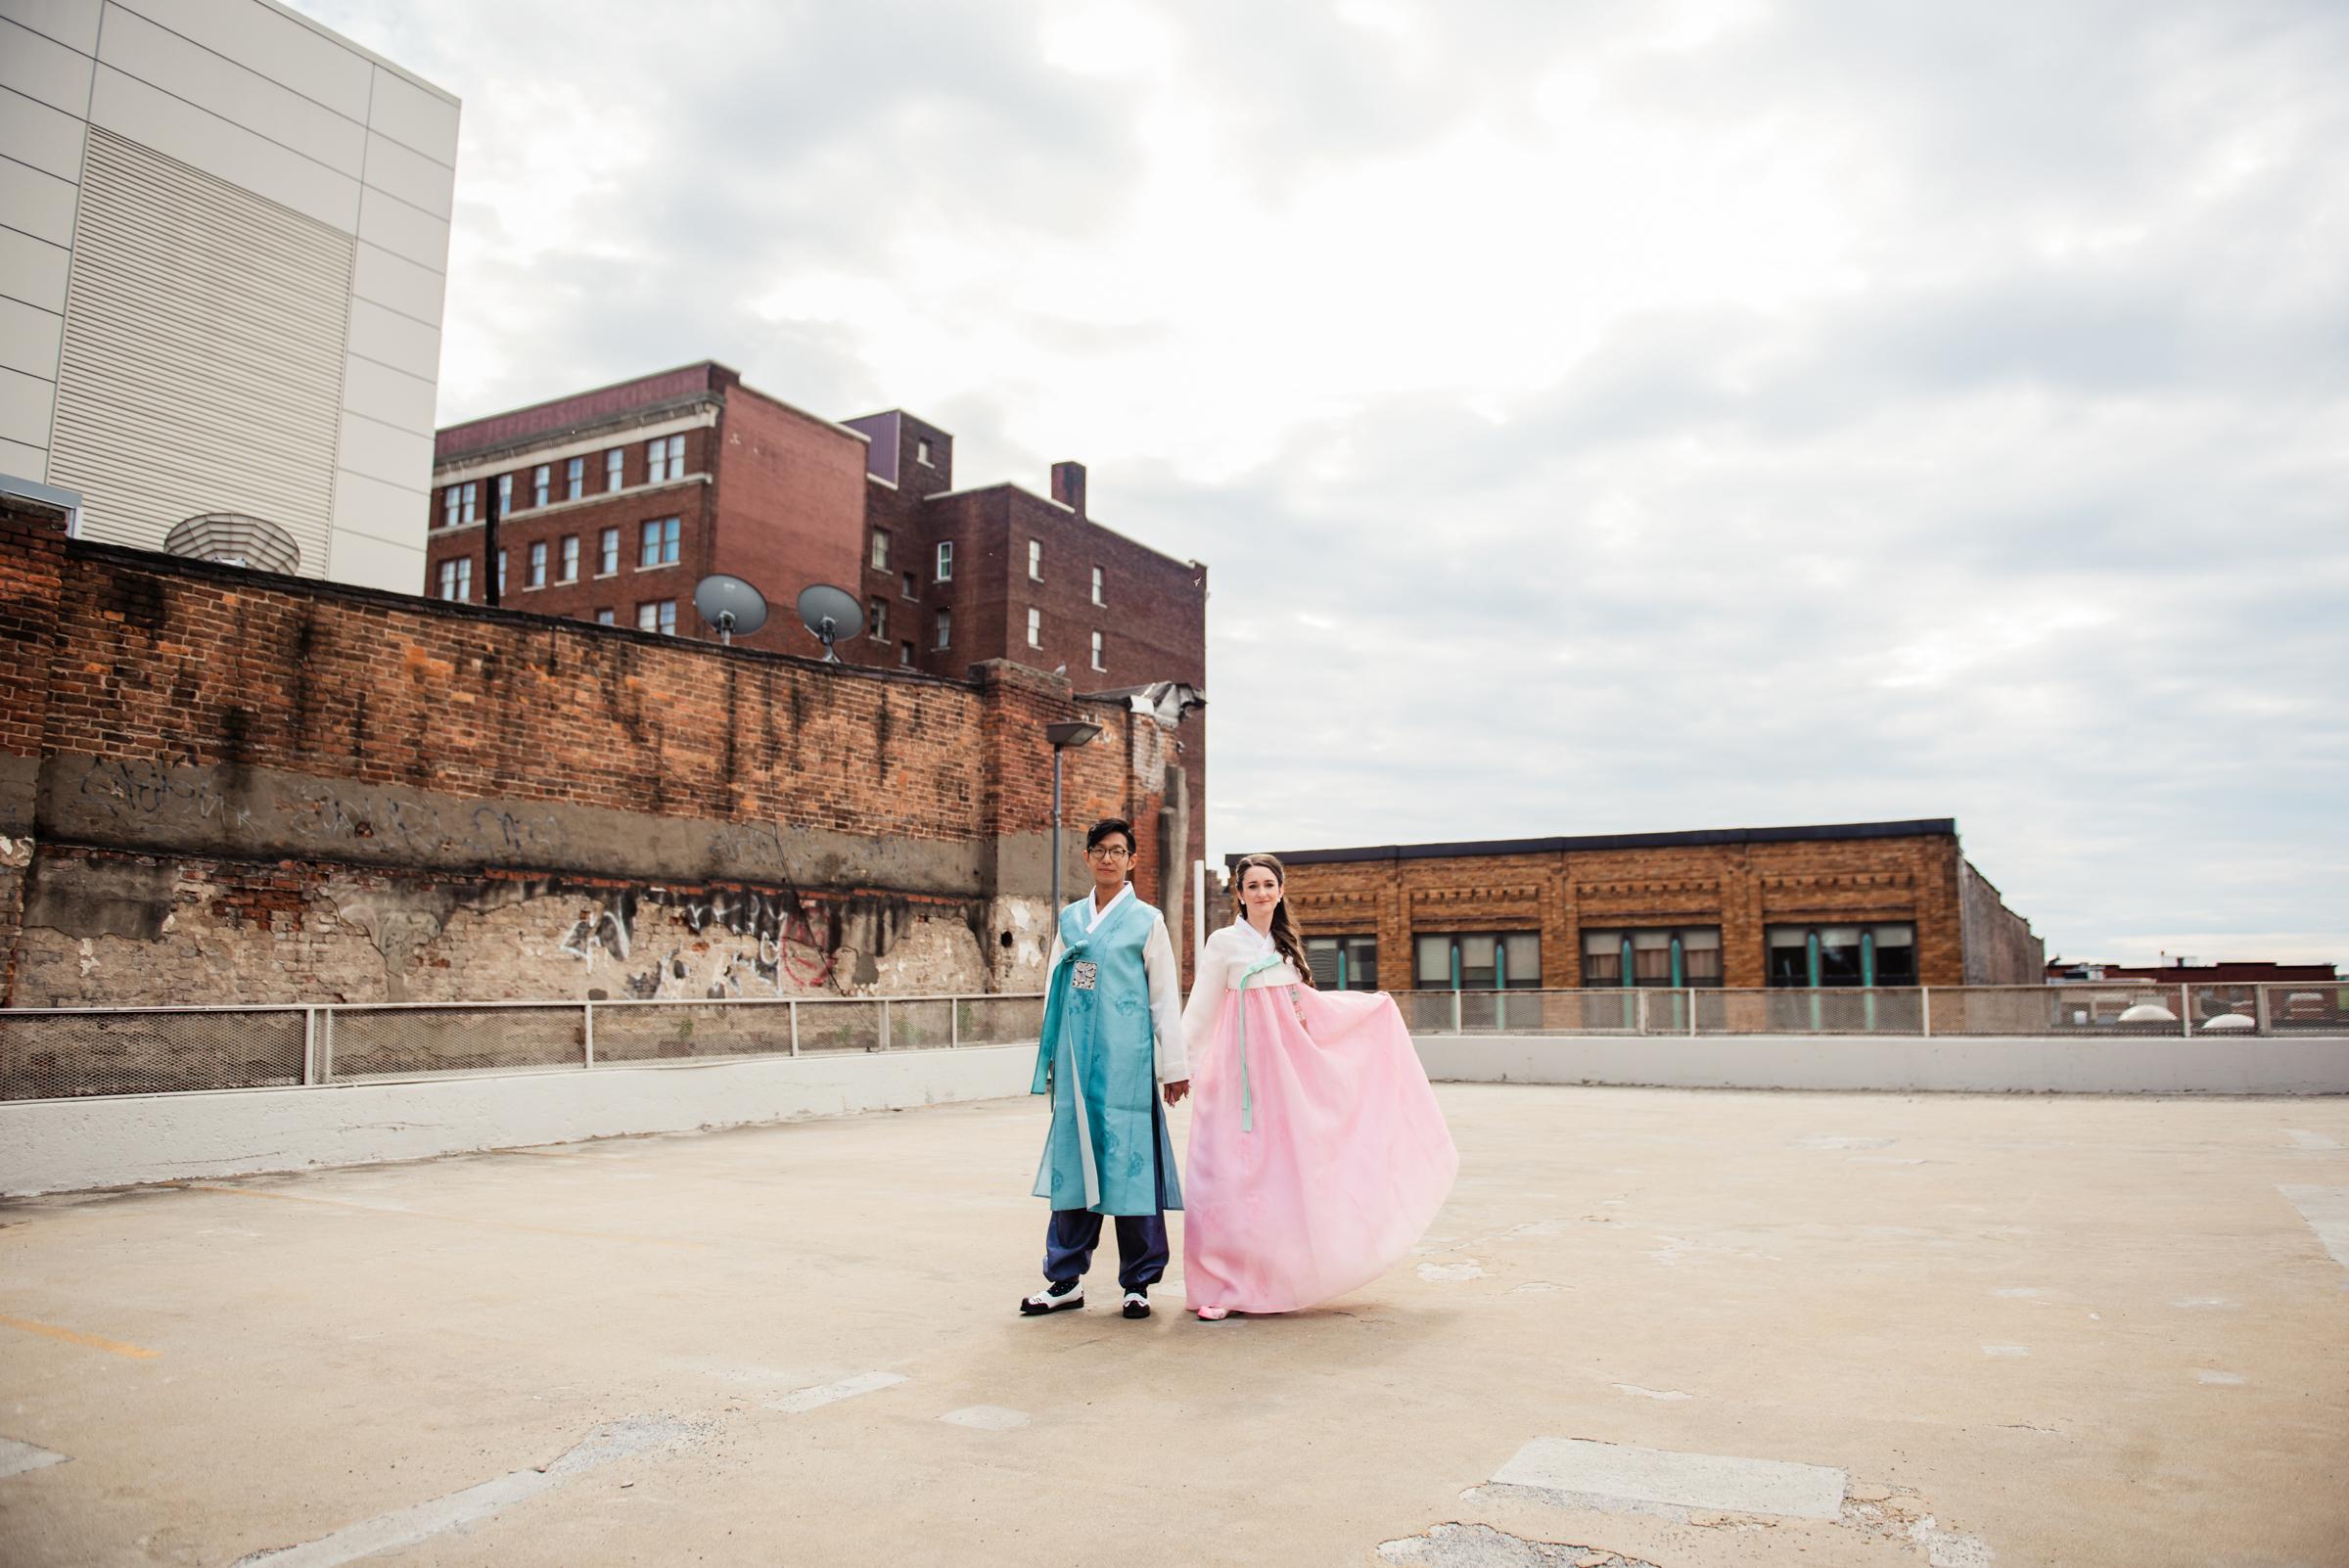 SKY_Armory_Syracuse_Wedding_JILL_STUDIO_Rochester_NY_Photographer_DSC_5612.jpg